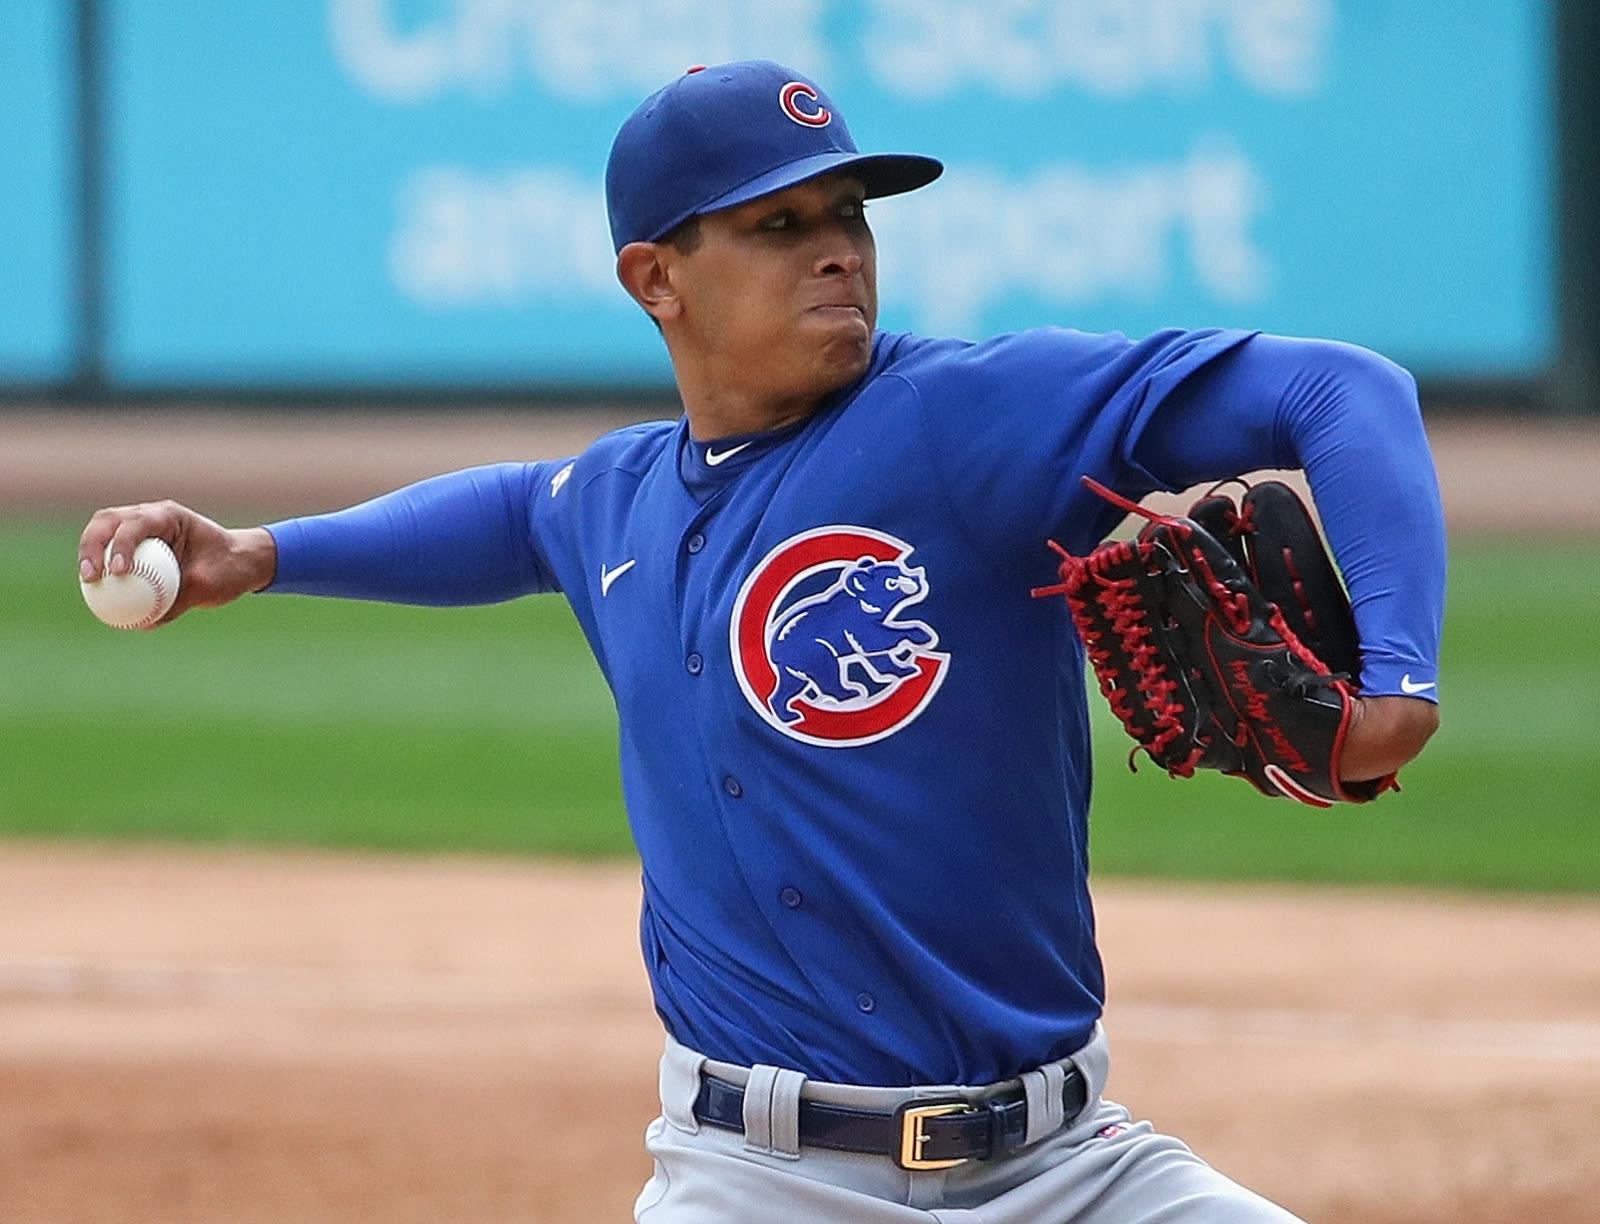 Chicago Cubs / Adbert Alzolay